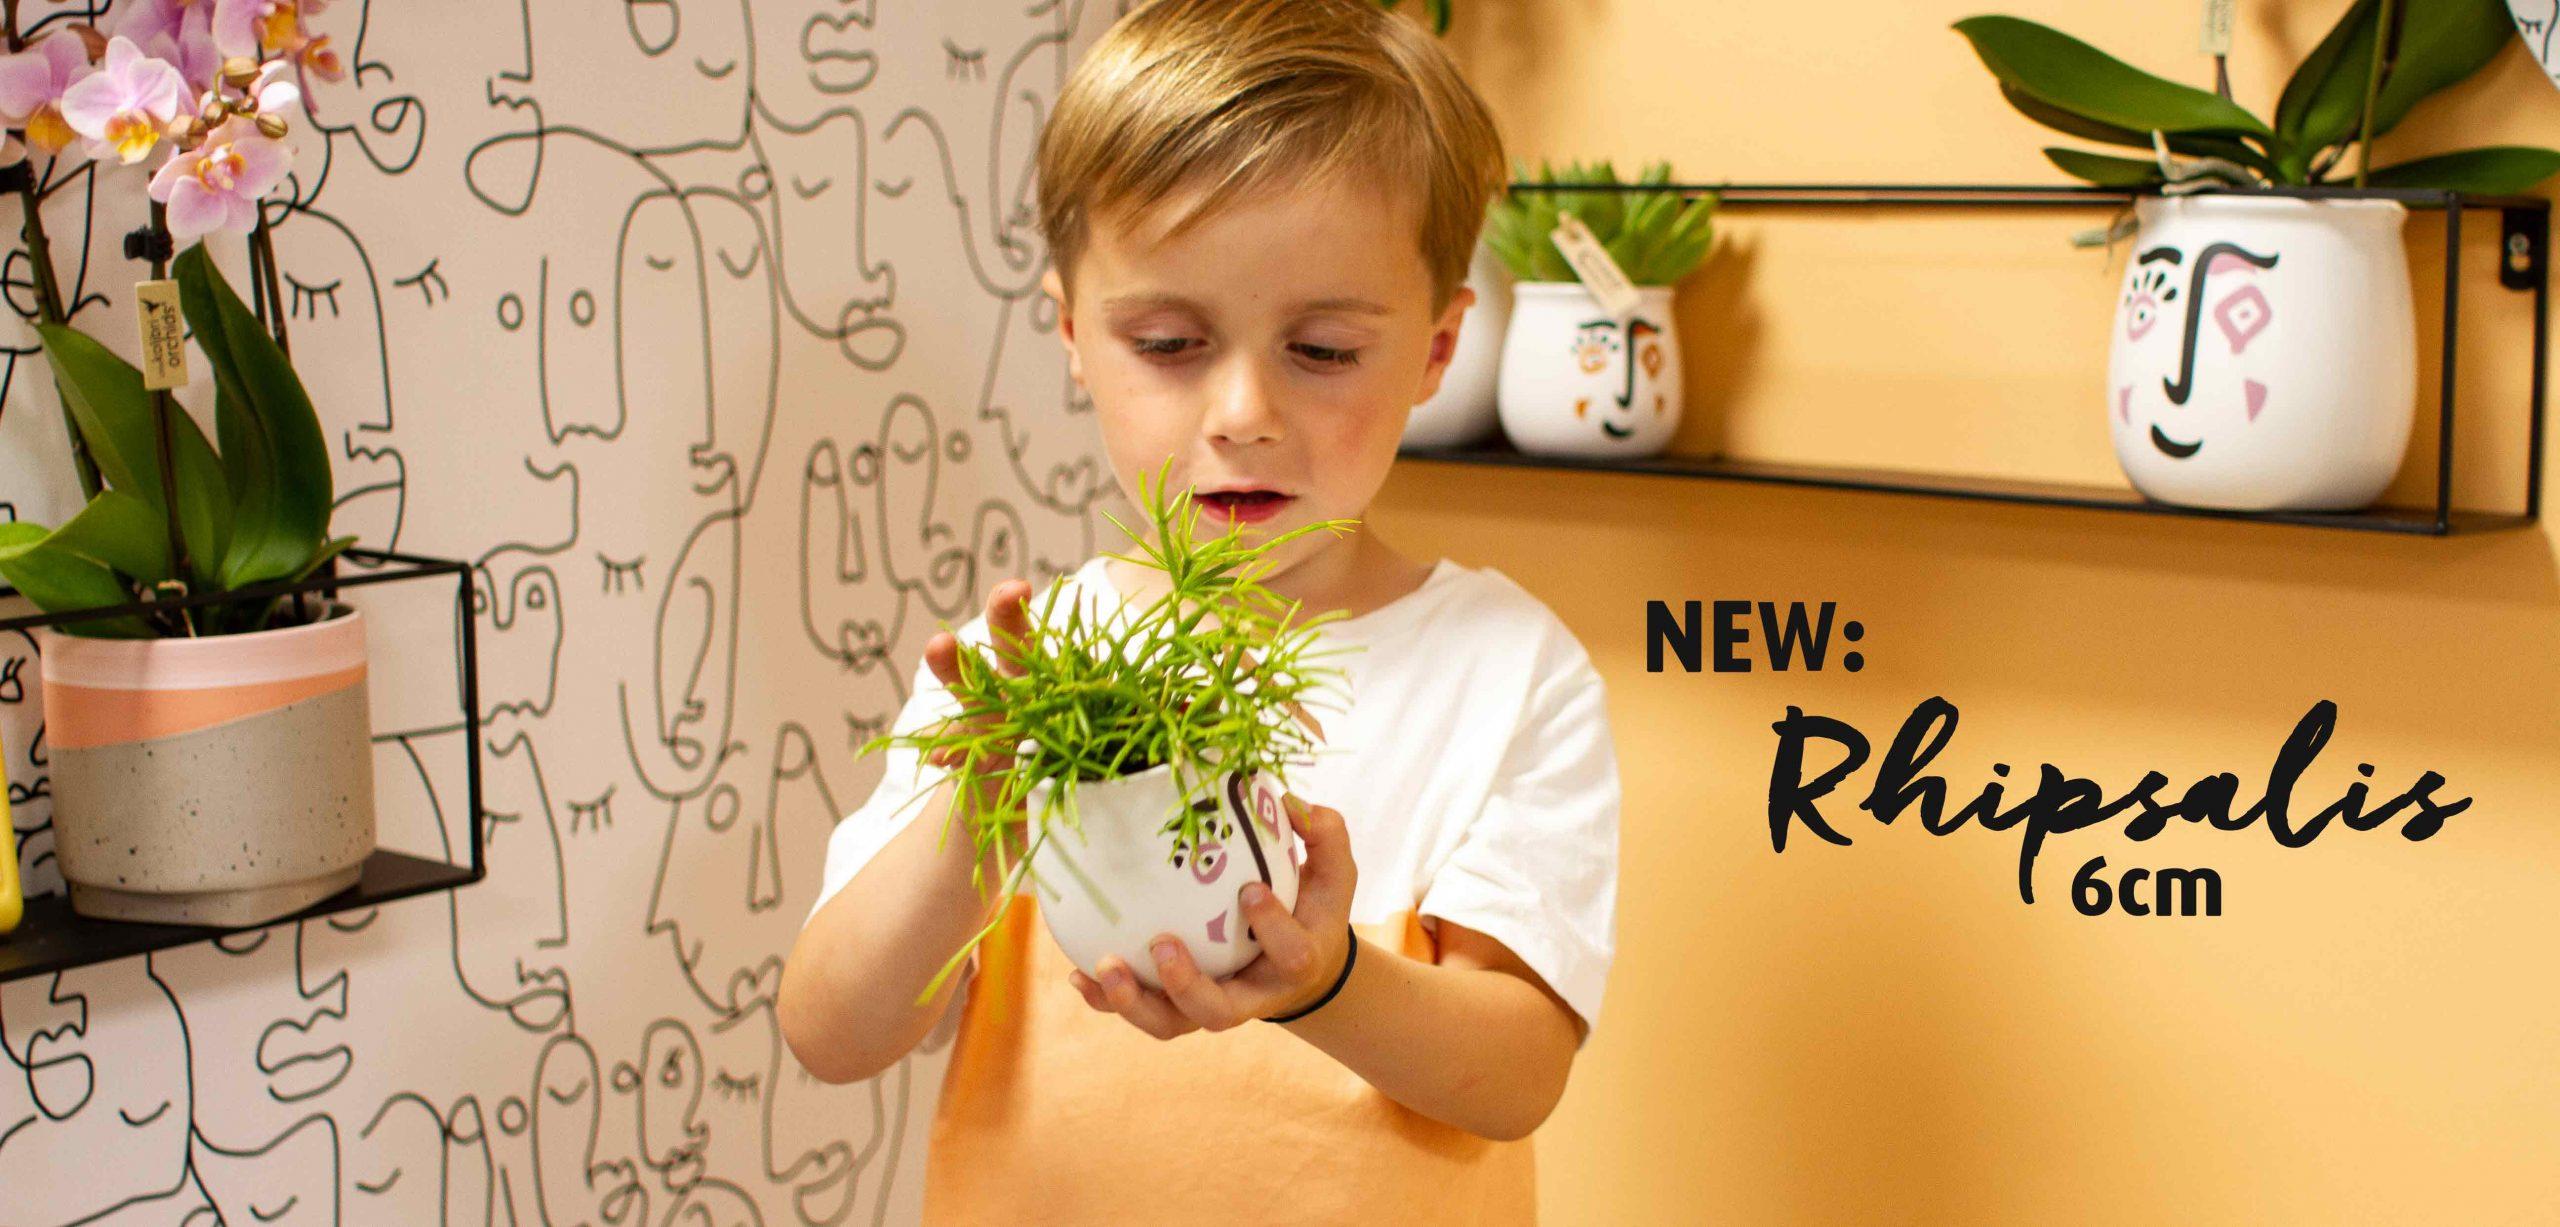 OK plant Rhipsalis